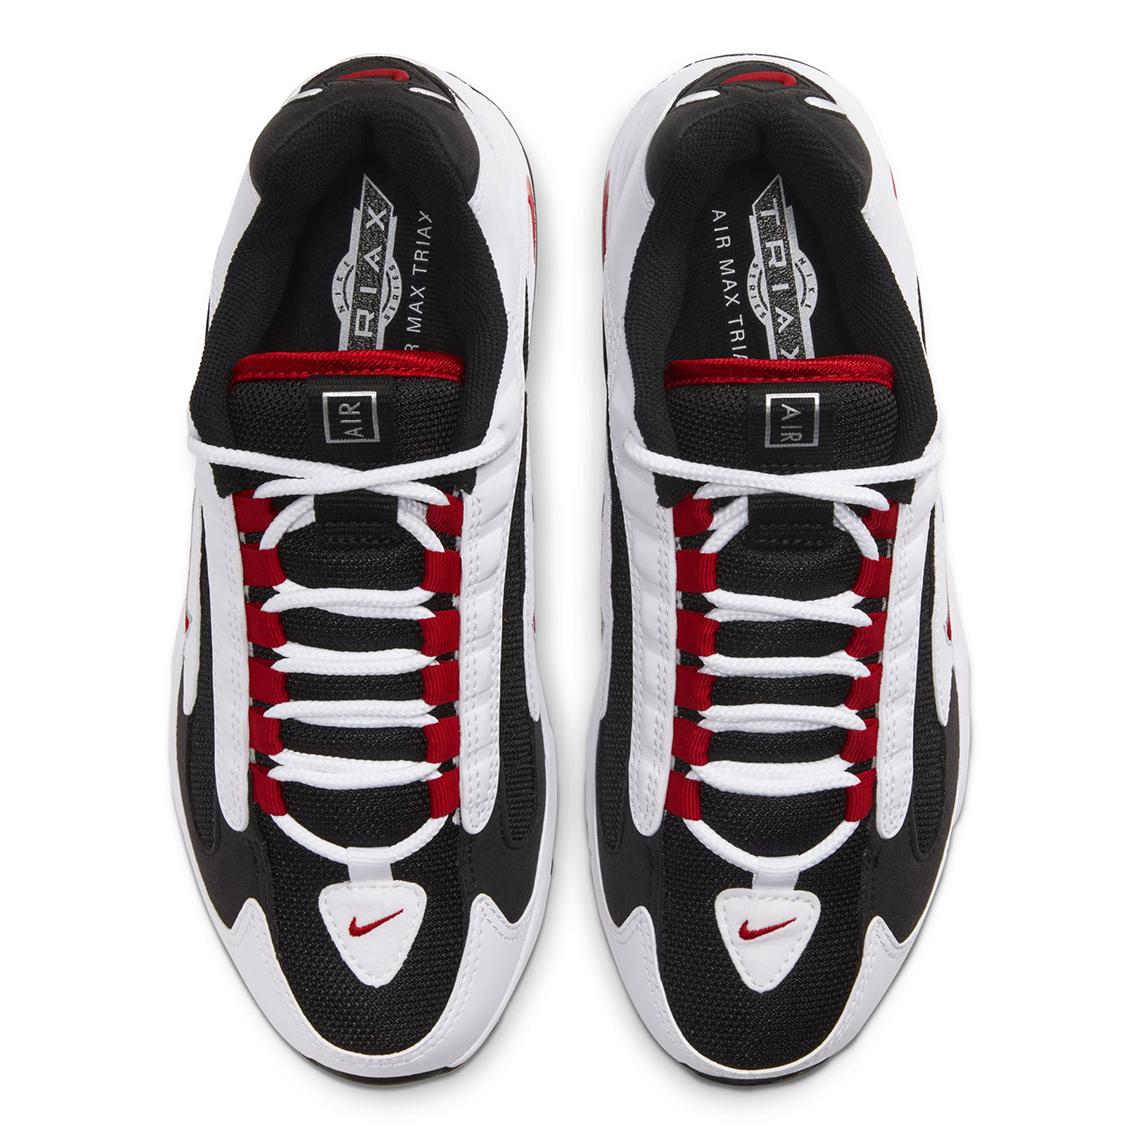 Nike Air Max Triax 96 University Red